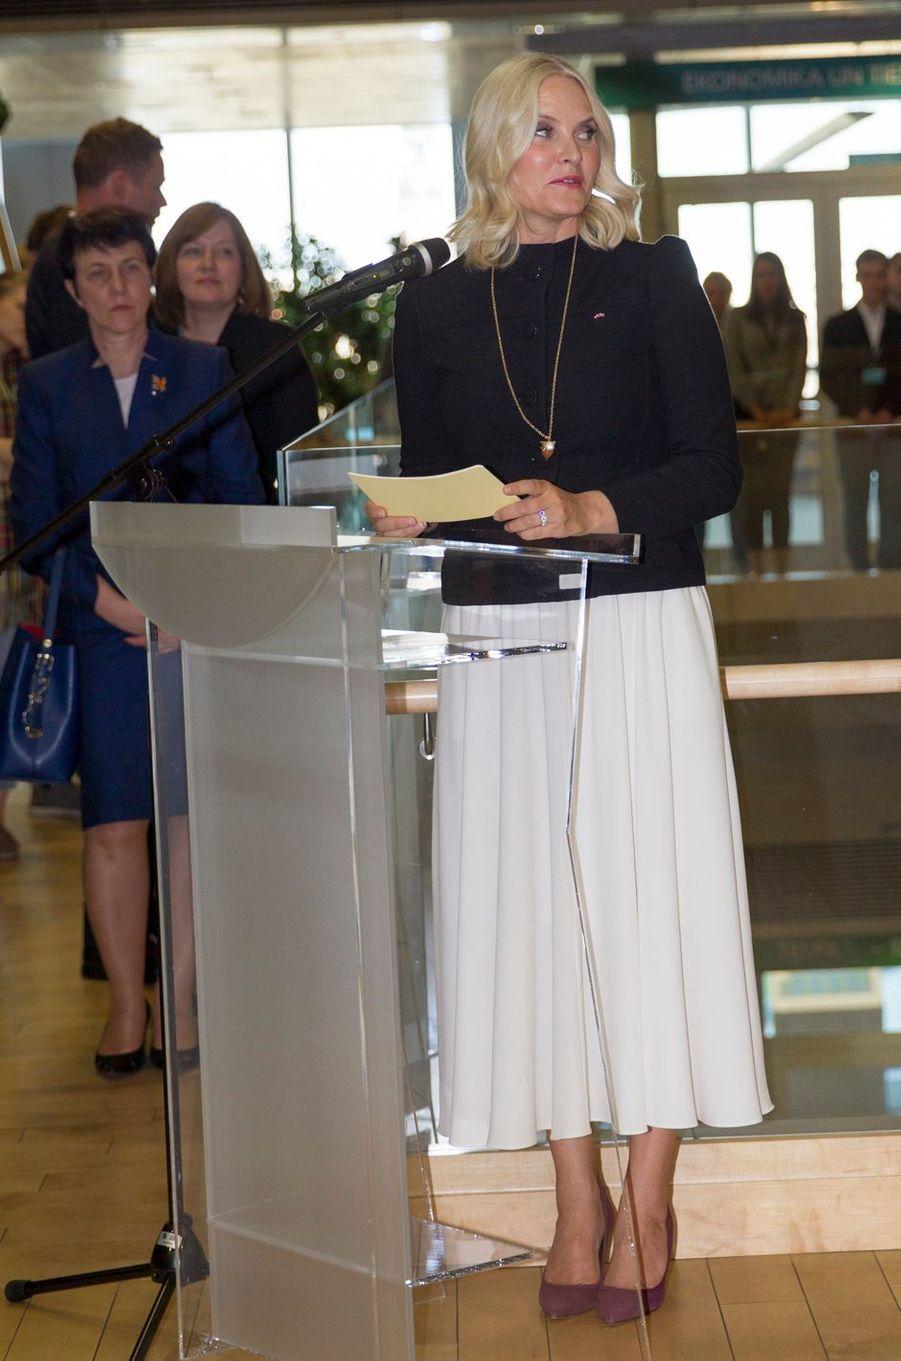 La princesse Mette-Marit de Norvège à Riga, le 23 avril 2018